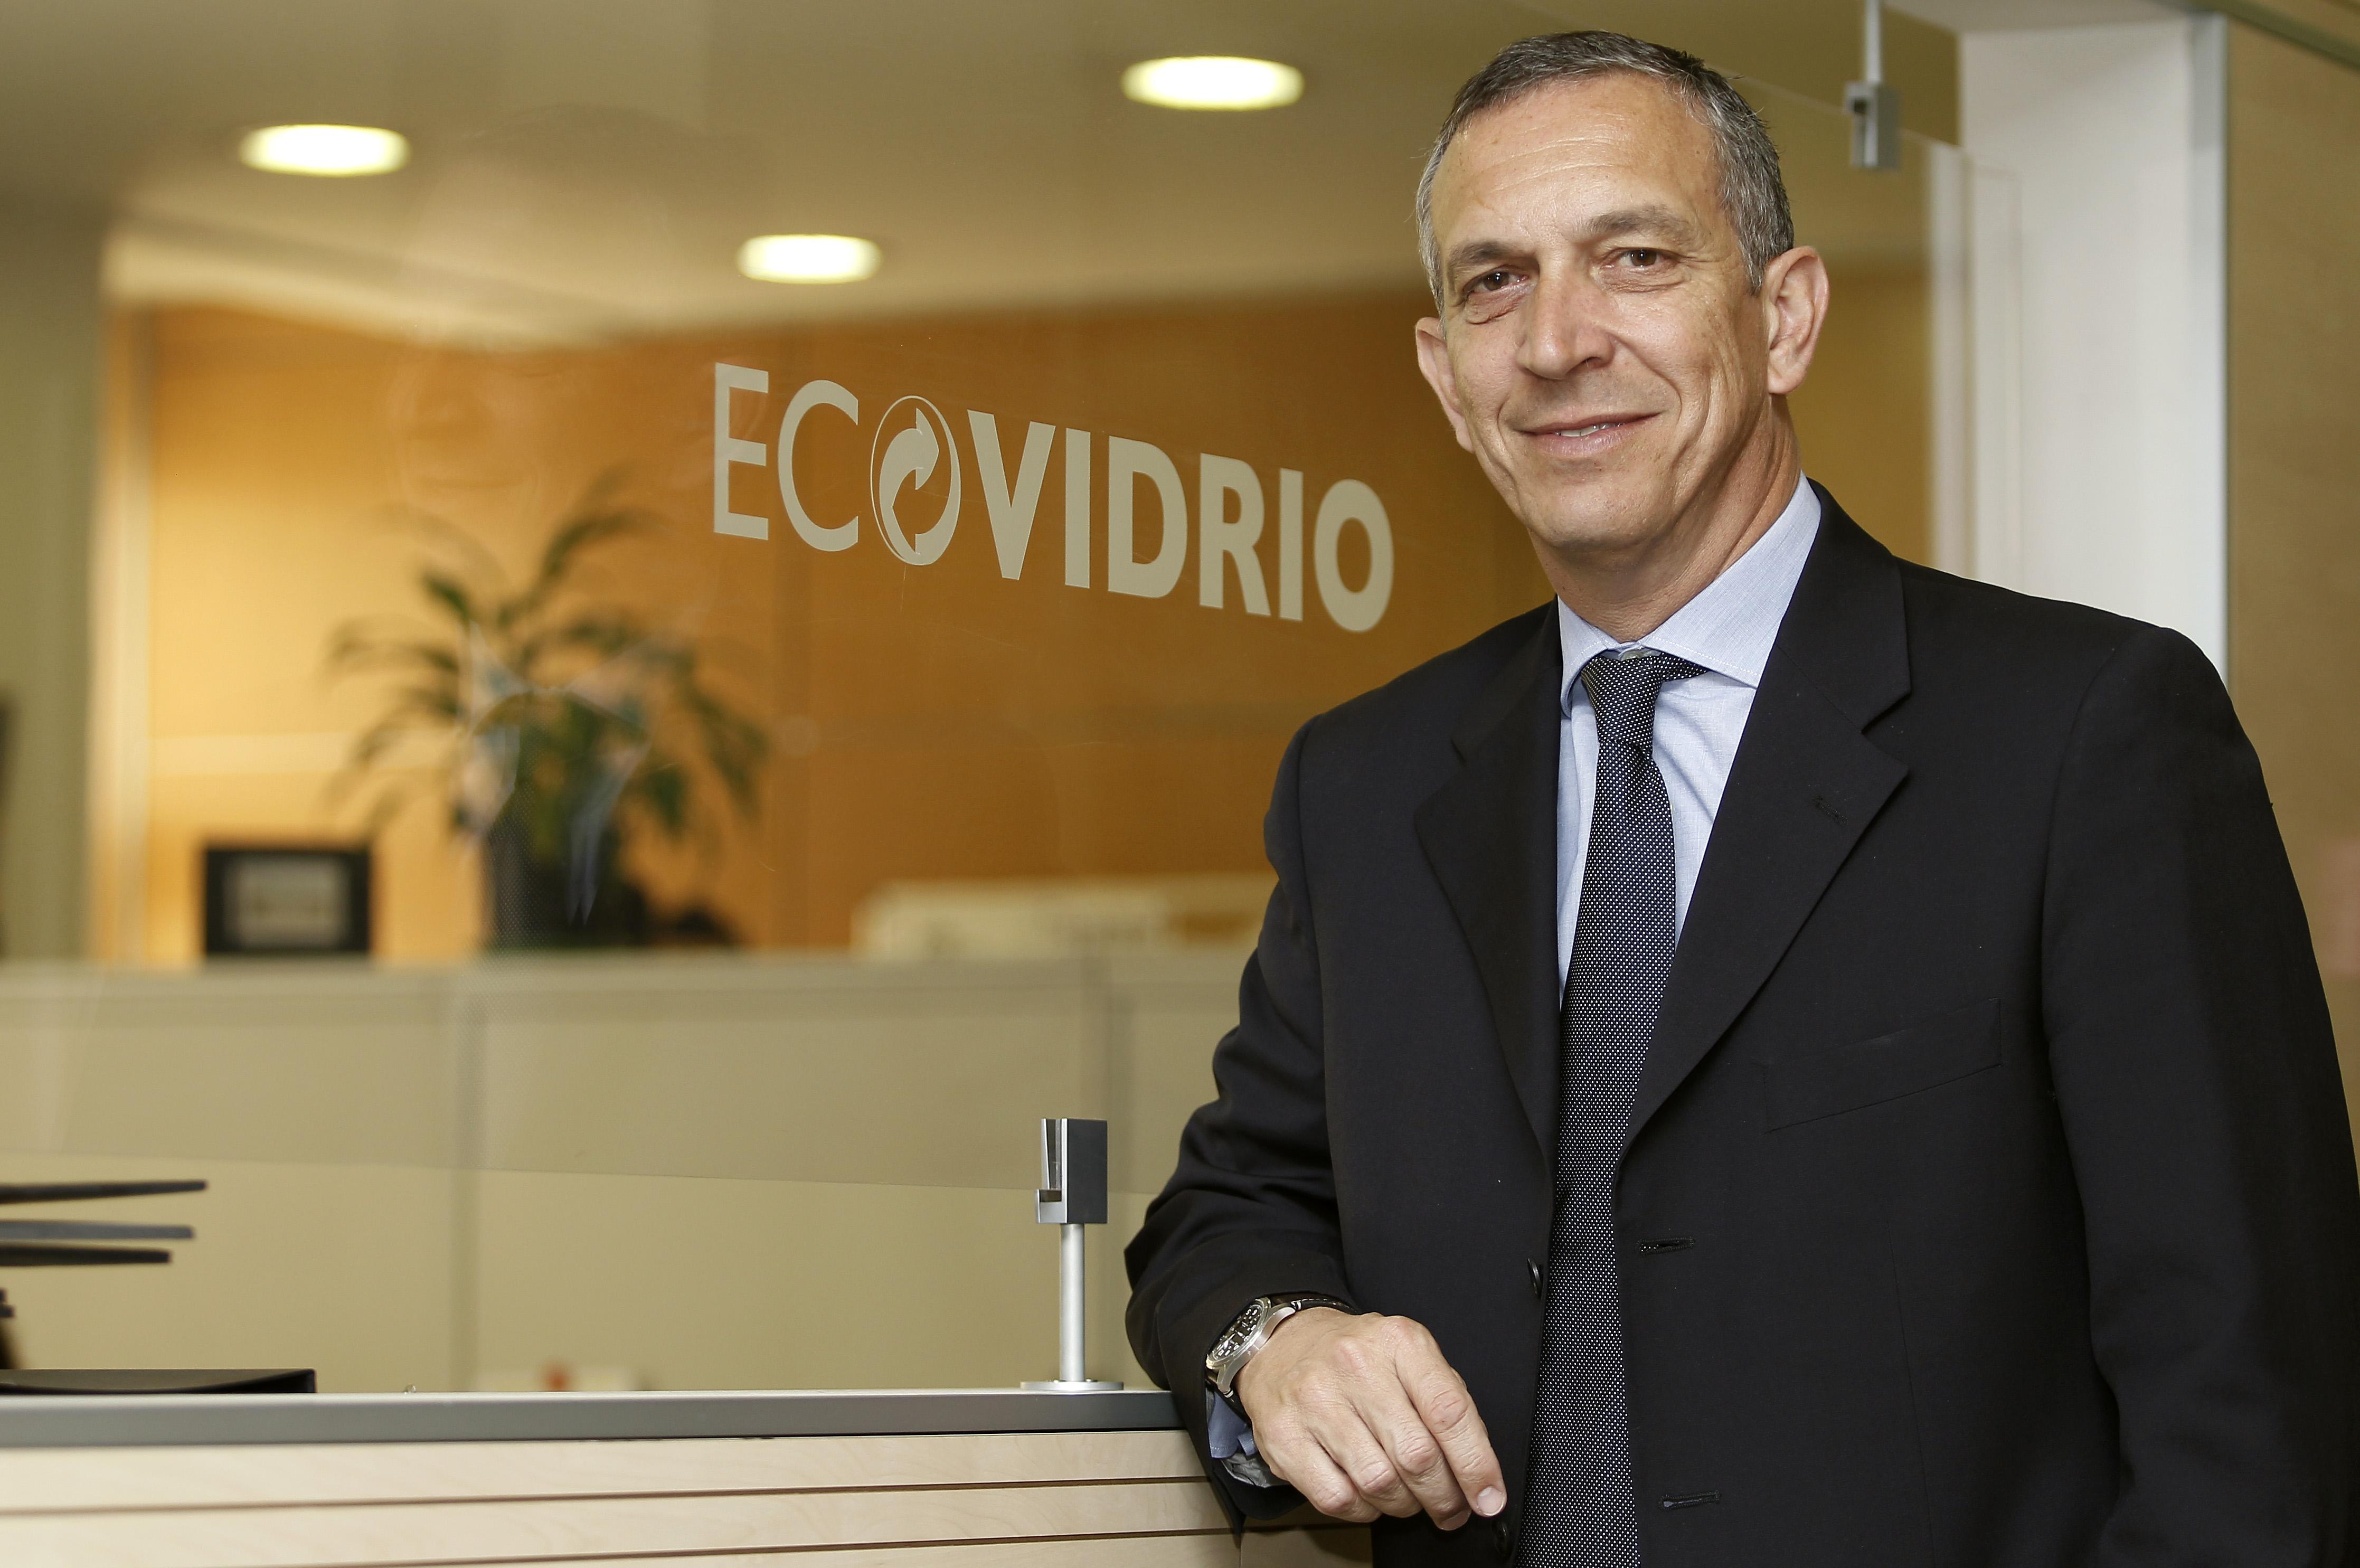 Entrevista a José Manuel Núñez-Lagos, Director General de Ecovidrio